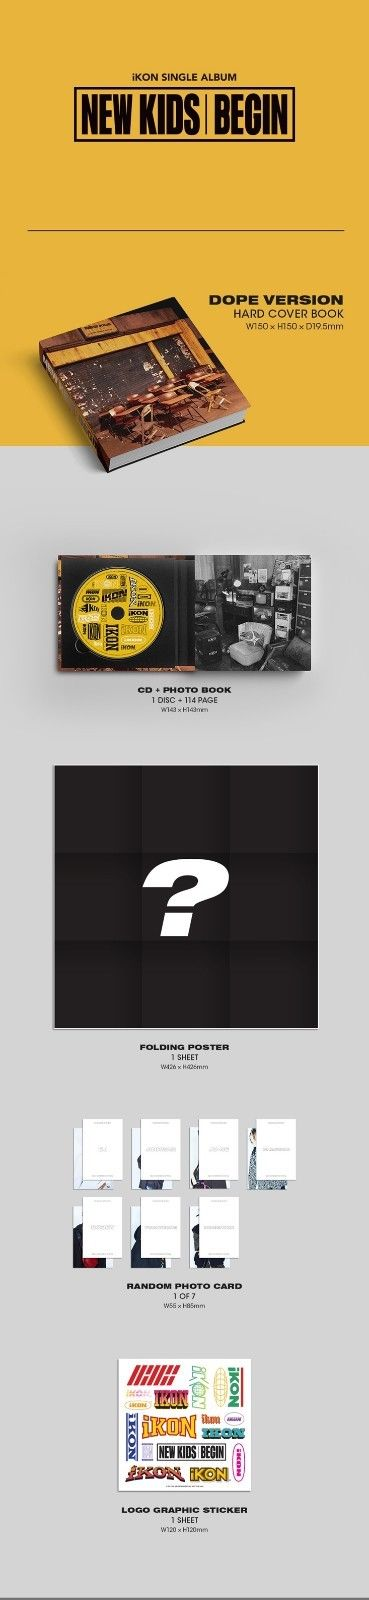 ikon, ikon album, ikon mini album, new kids, the beginning, iwonchuu, kpop, nederland